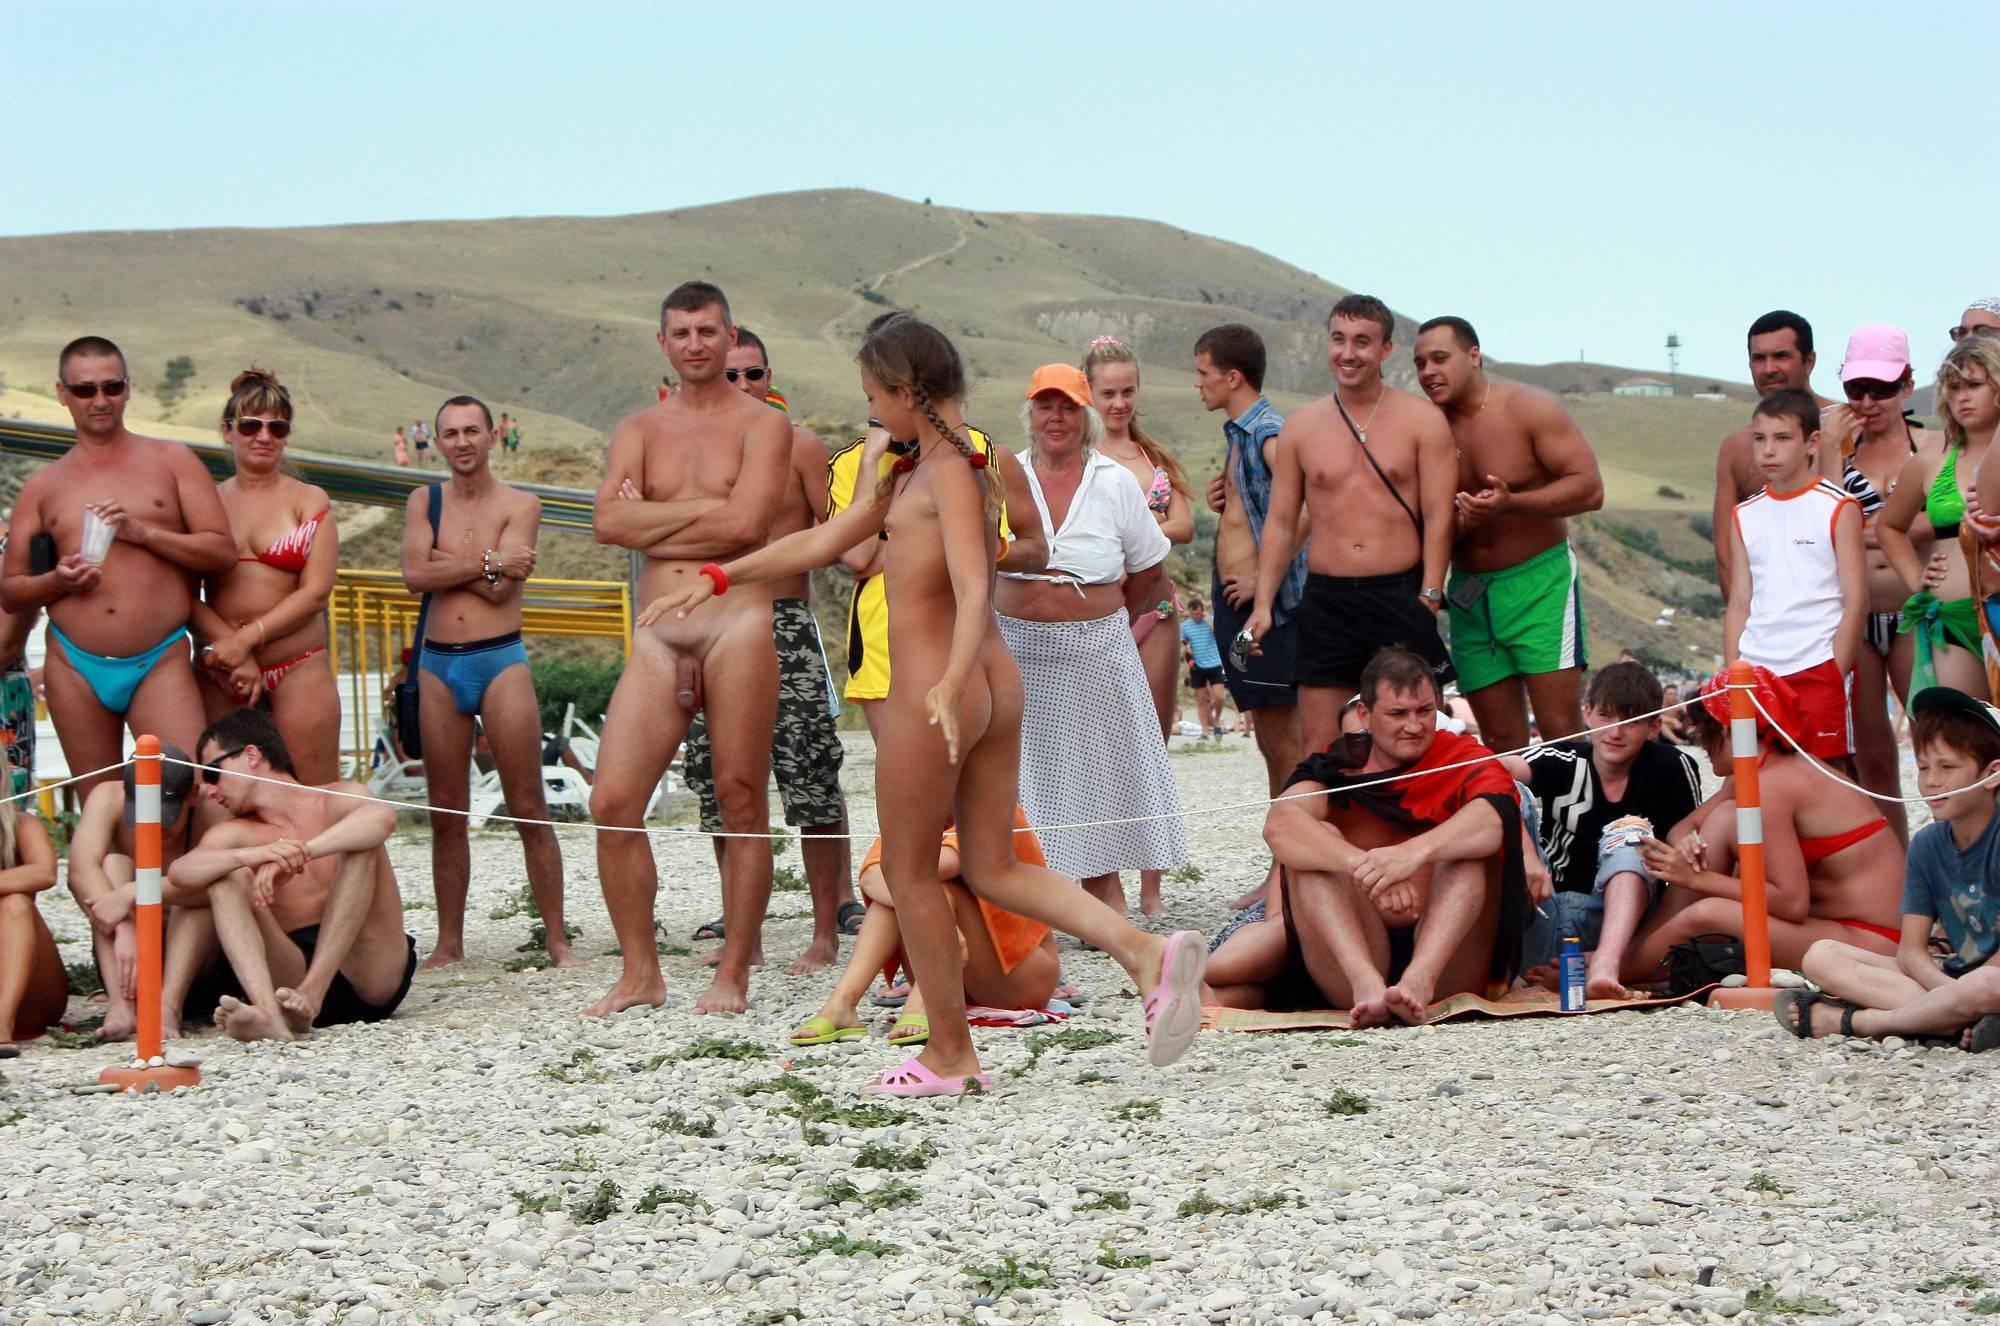 Nudist Photos Nudist Braid Beach Stride - 2